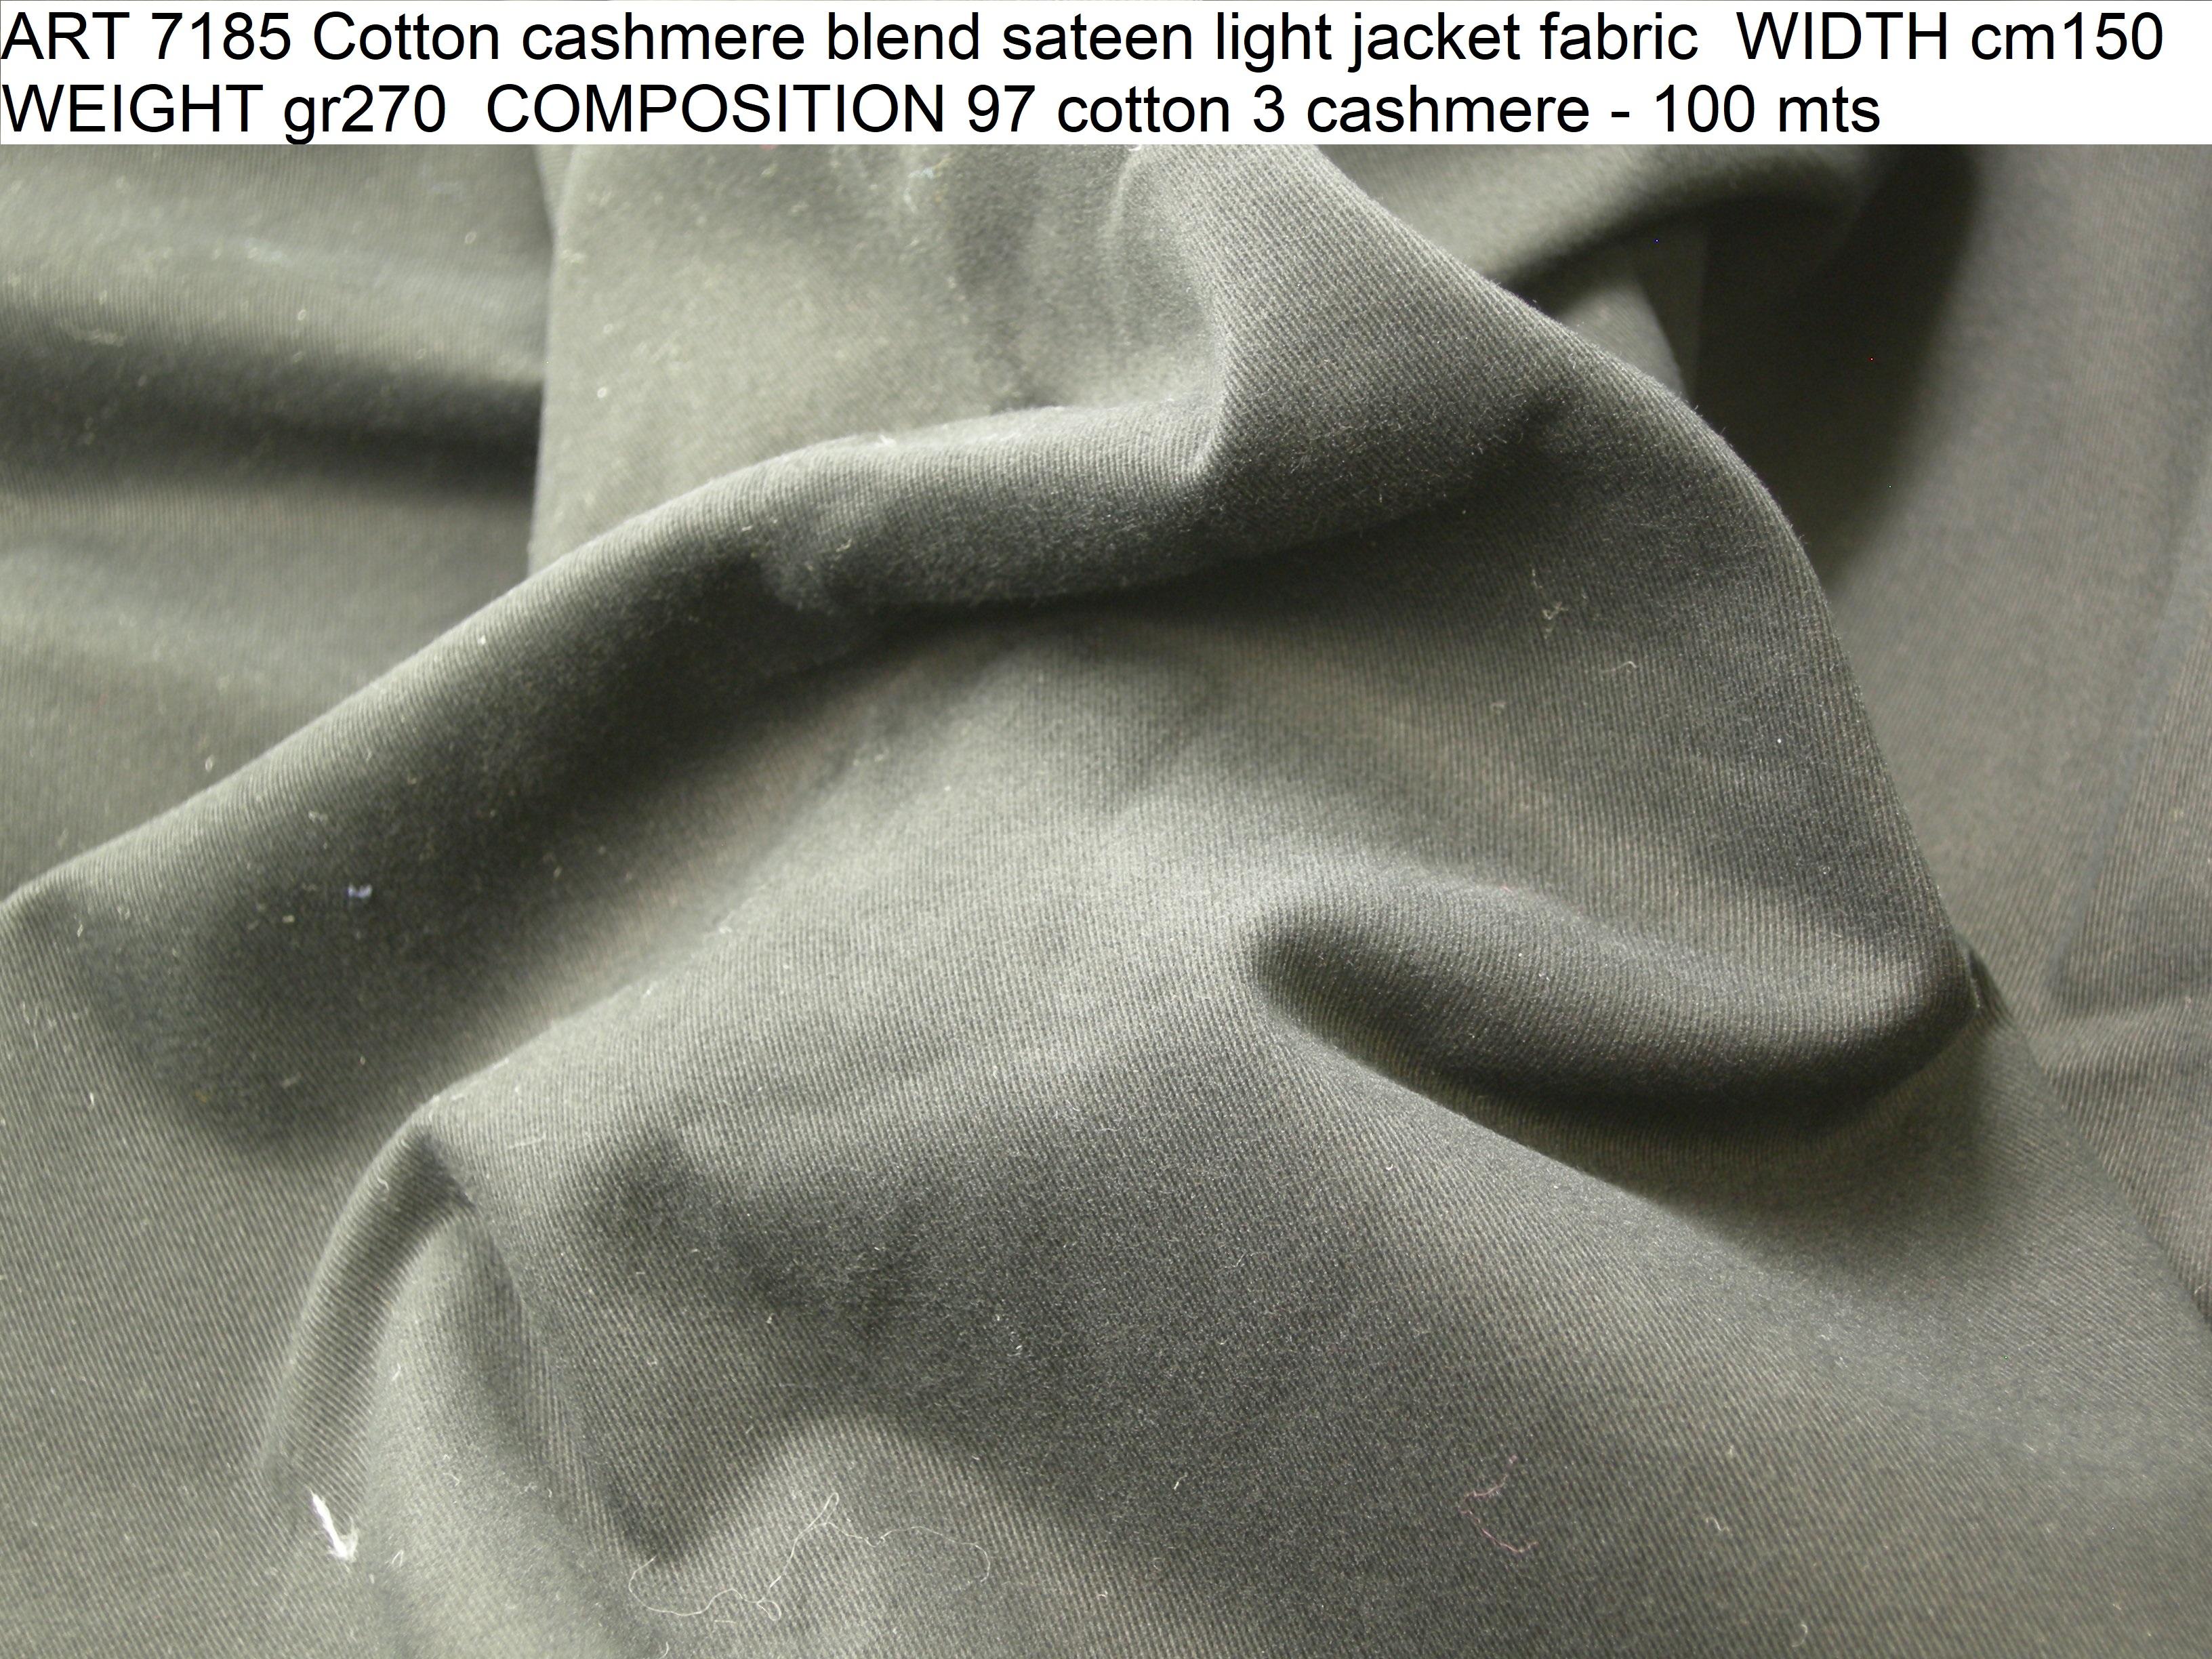 ART 7185 Cotton cashmere blend sateen light jacket fabric WIDTH cm150 WEIGHT gr270 COMPOSITION 97 cotton 3 cashmere - 100 mts